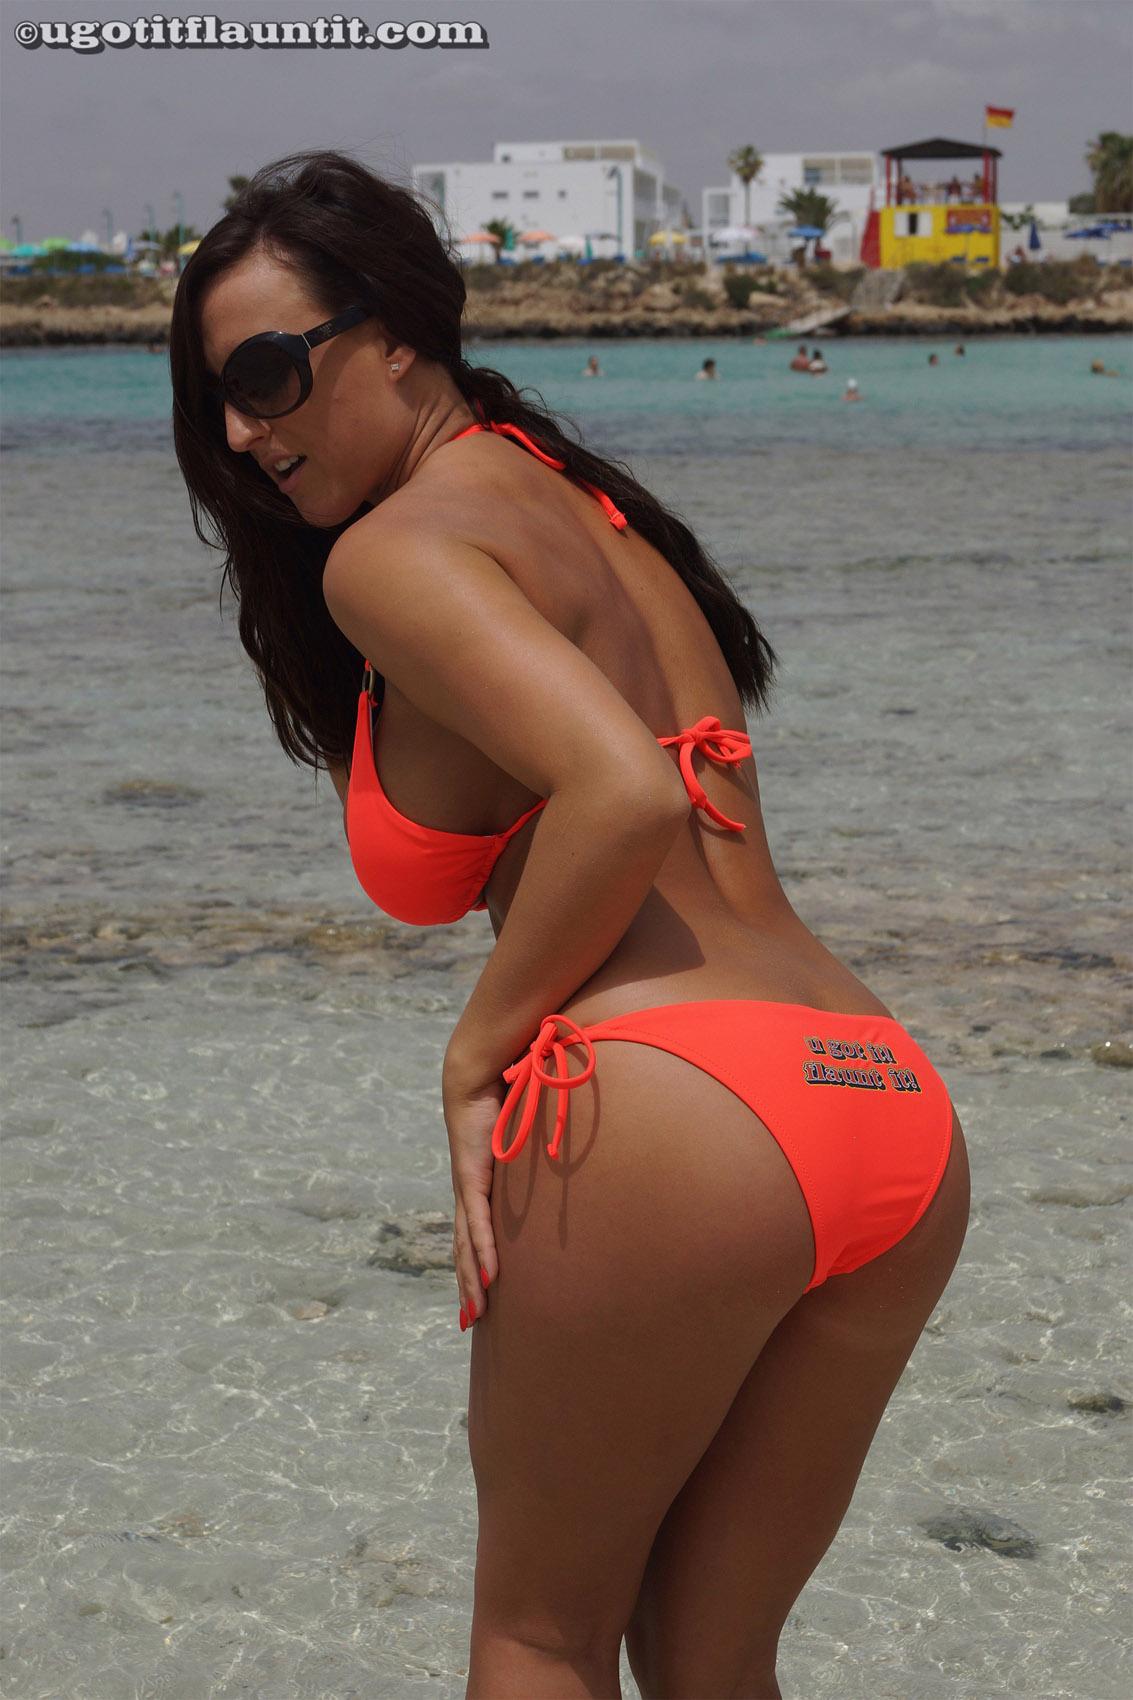 Big beach tits but